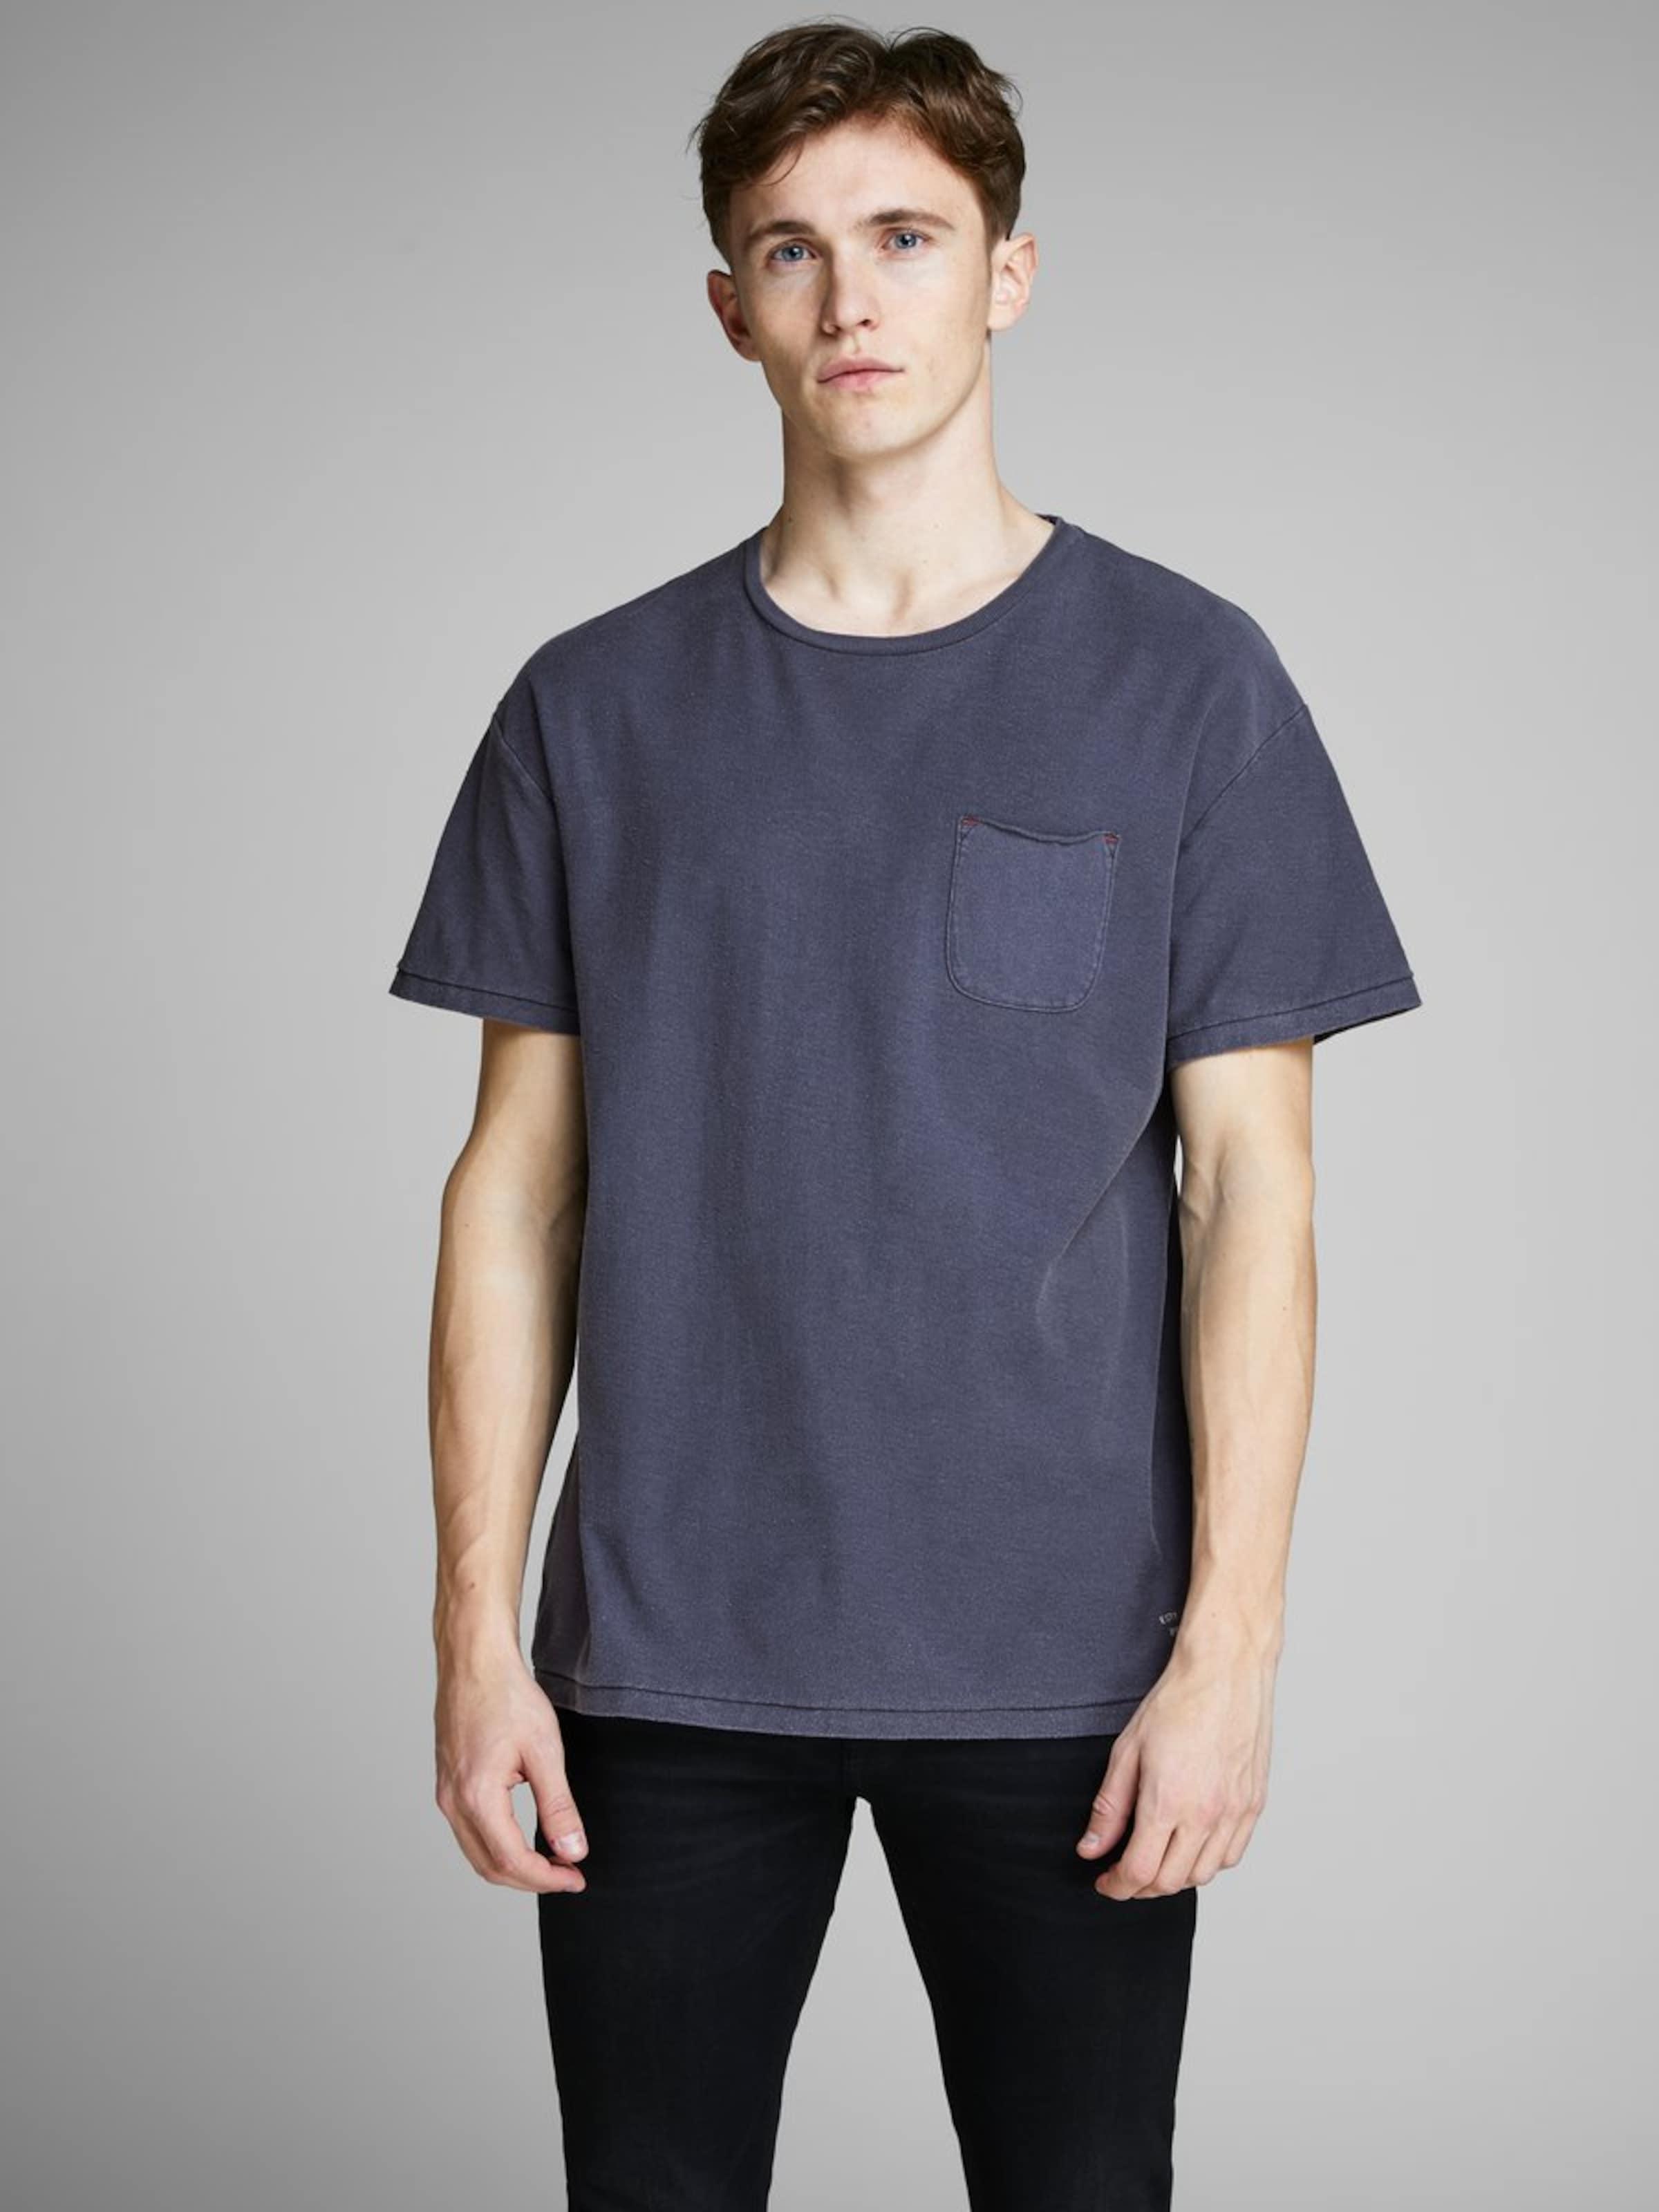 En Blanc Jackamp; shirt Jones T 35jLqRA4